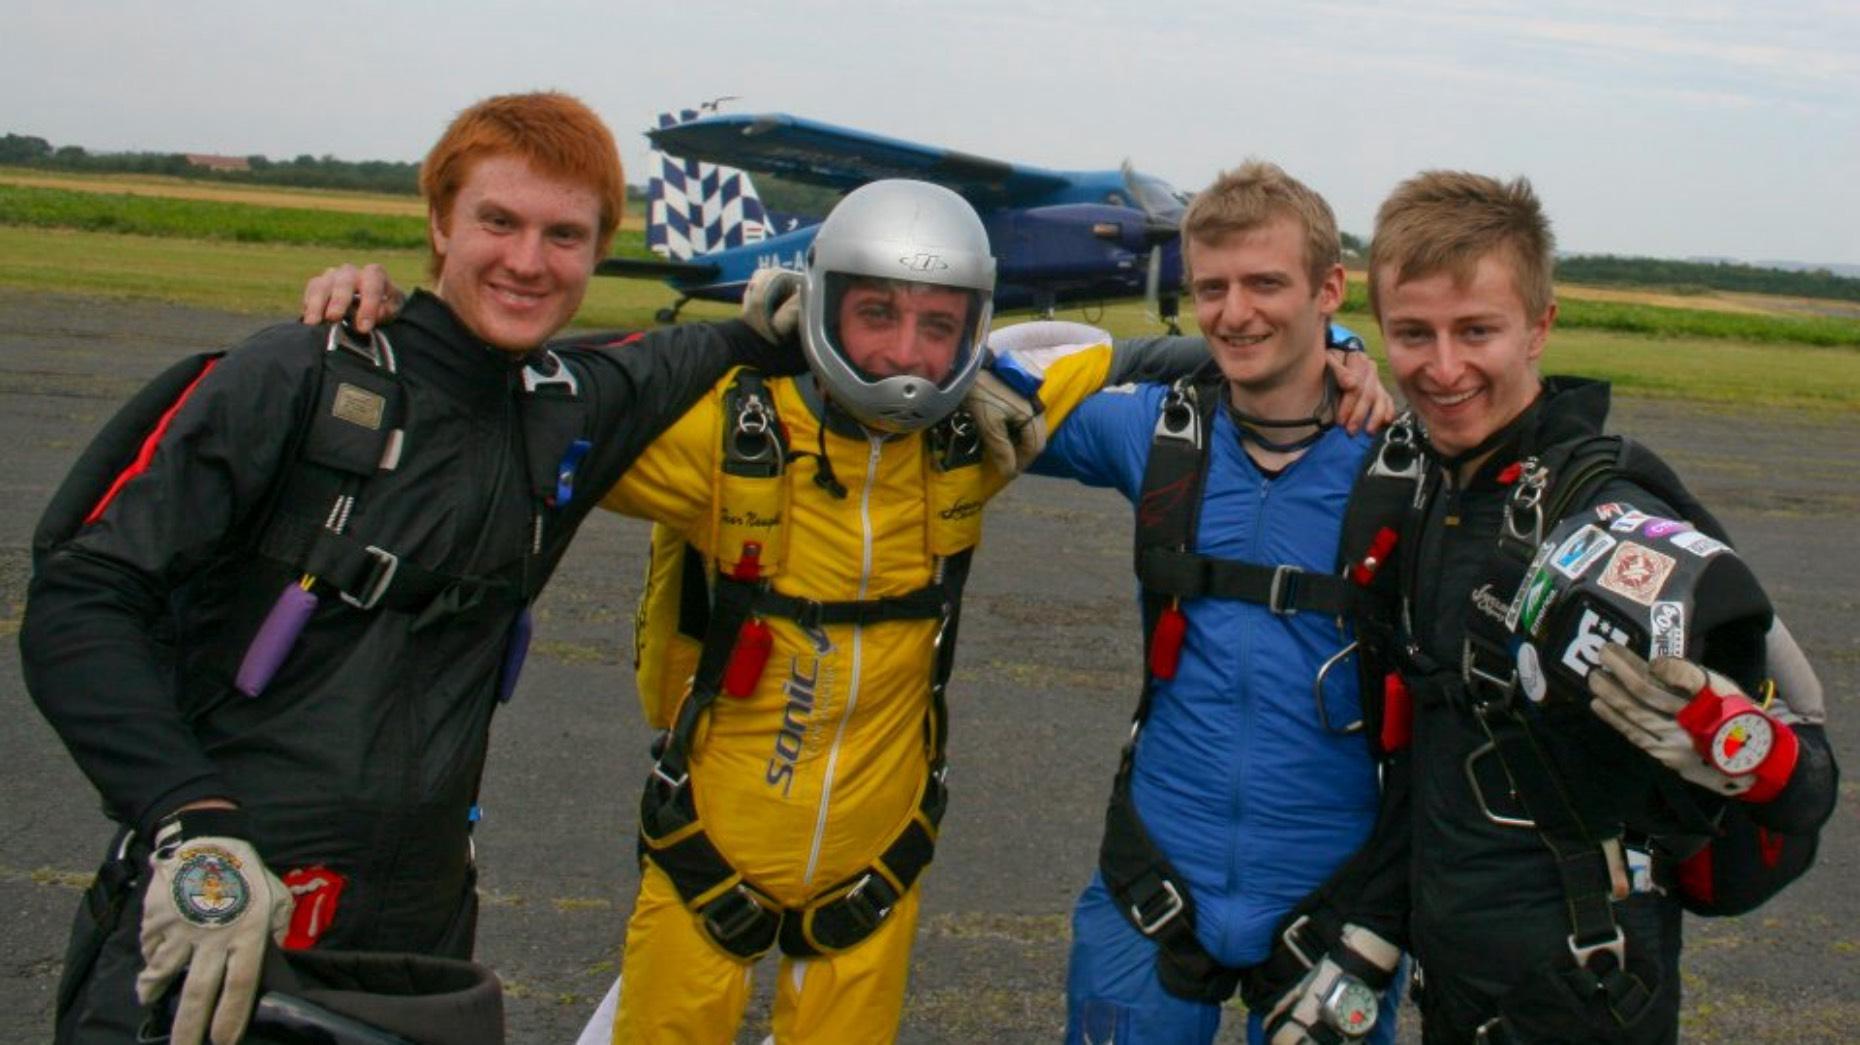 Photo: Skydiving Championships